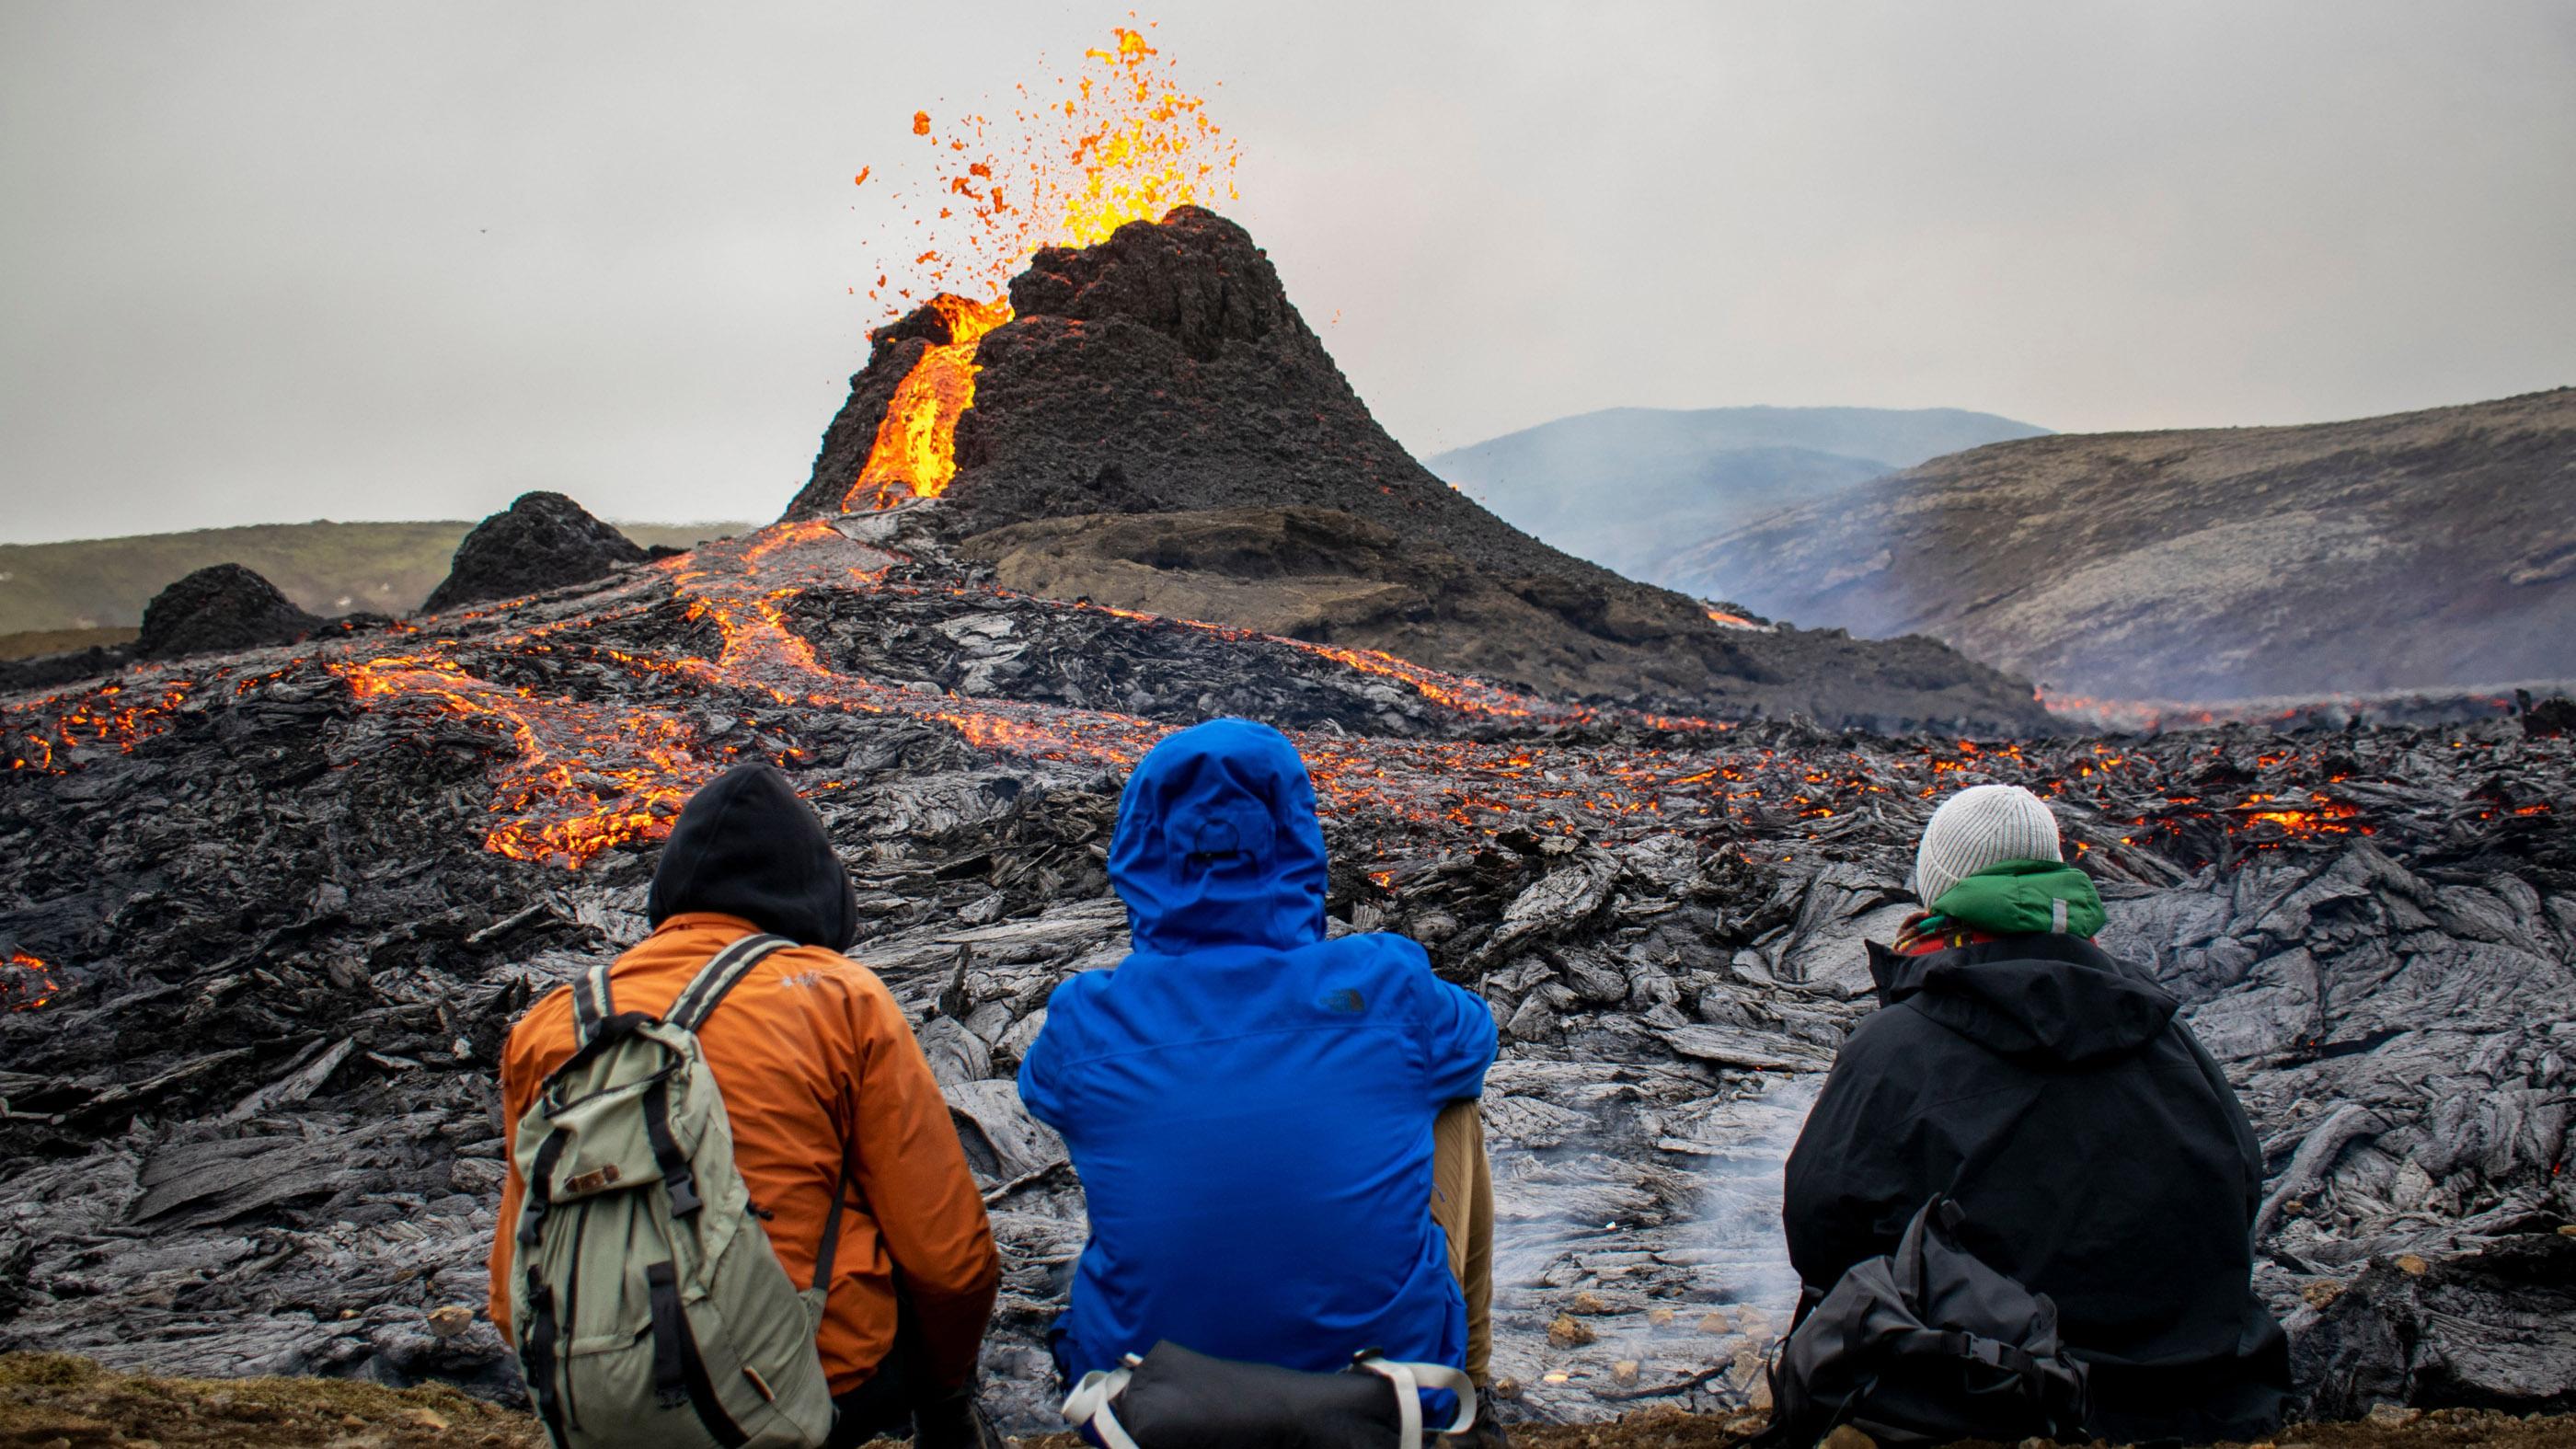 Drone footage reveals dramatic Iceland volcanic eruption i6rxNH97V4mi3s8qNFyMHh